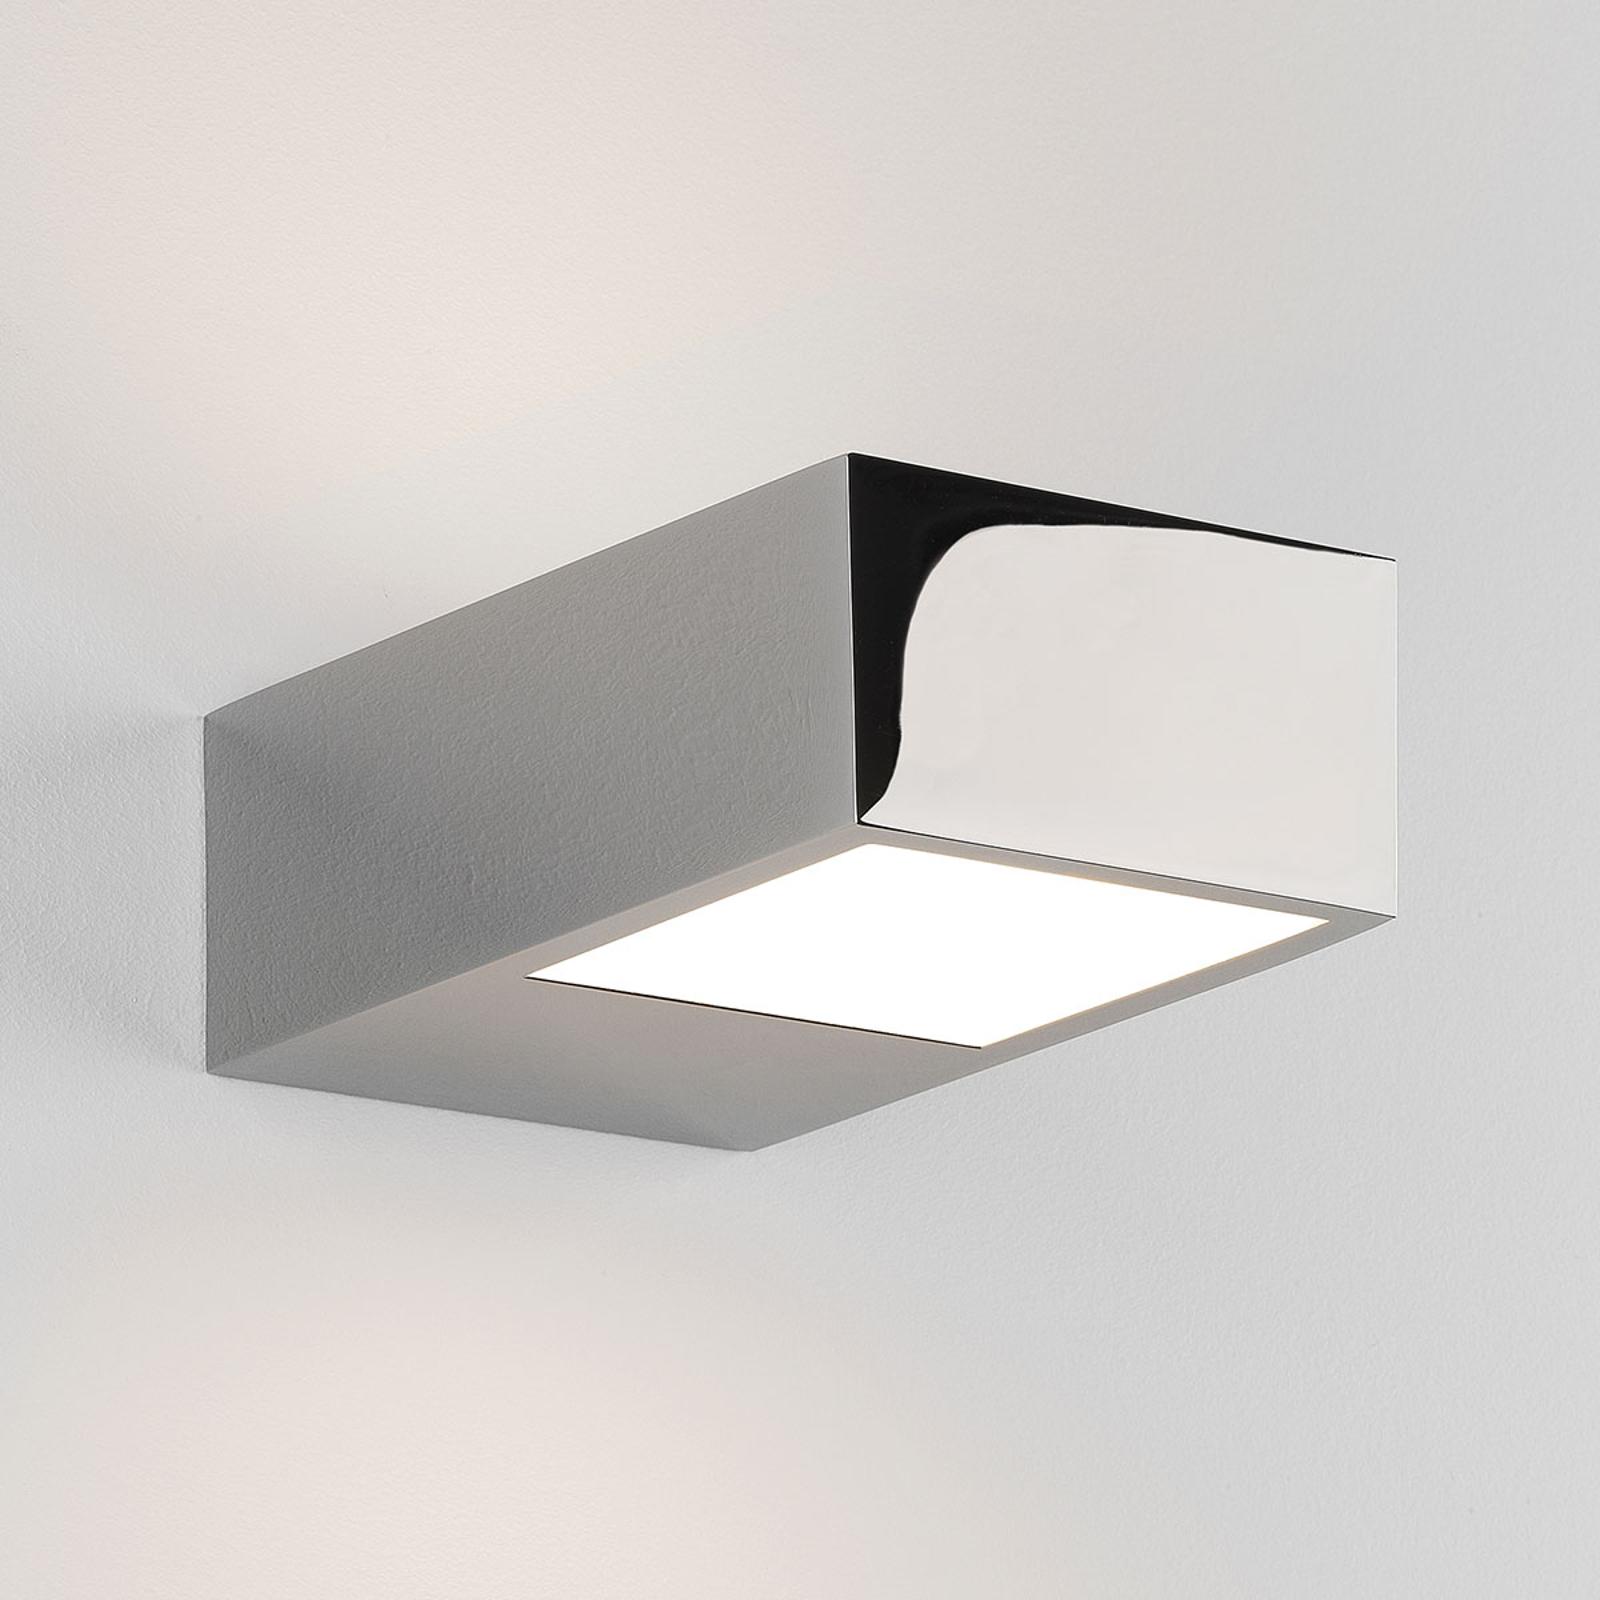 Astro Kappa - eckige LED-Wandlampe fürs Bad, chrom